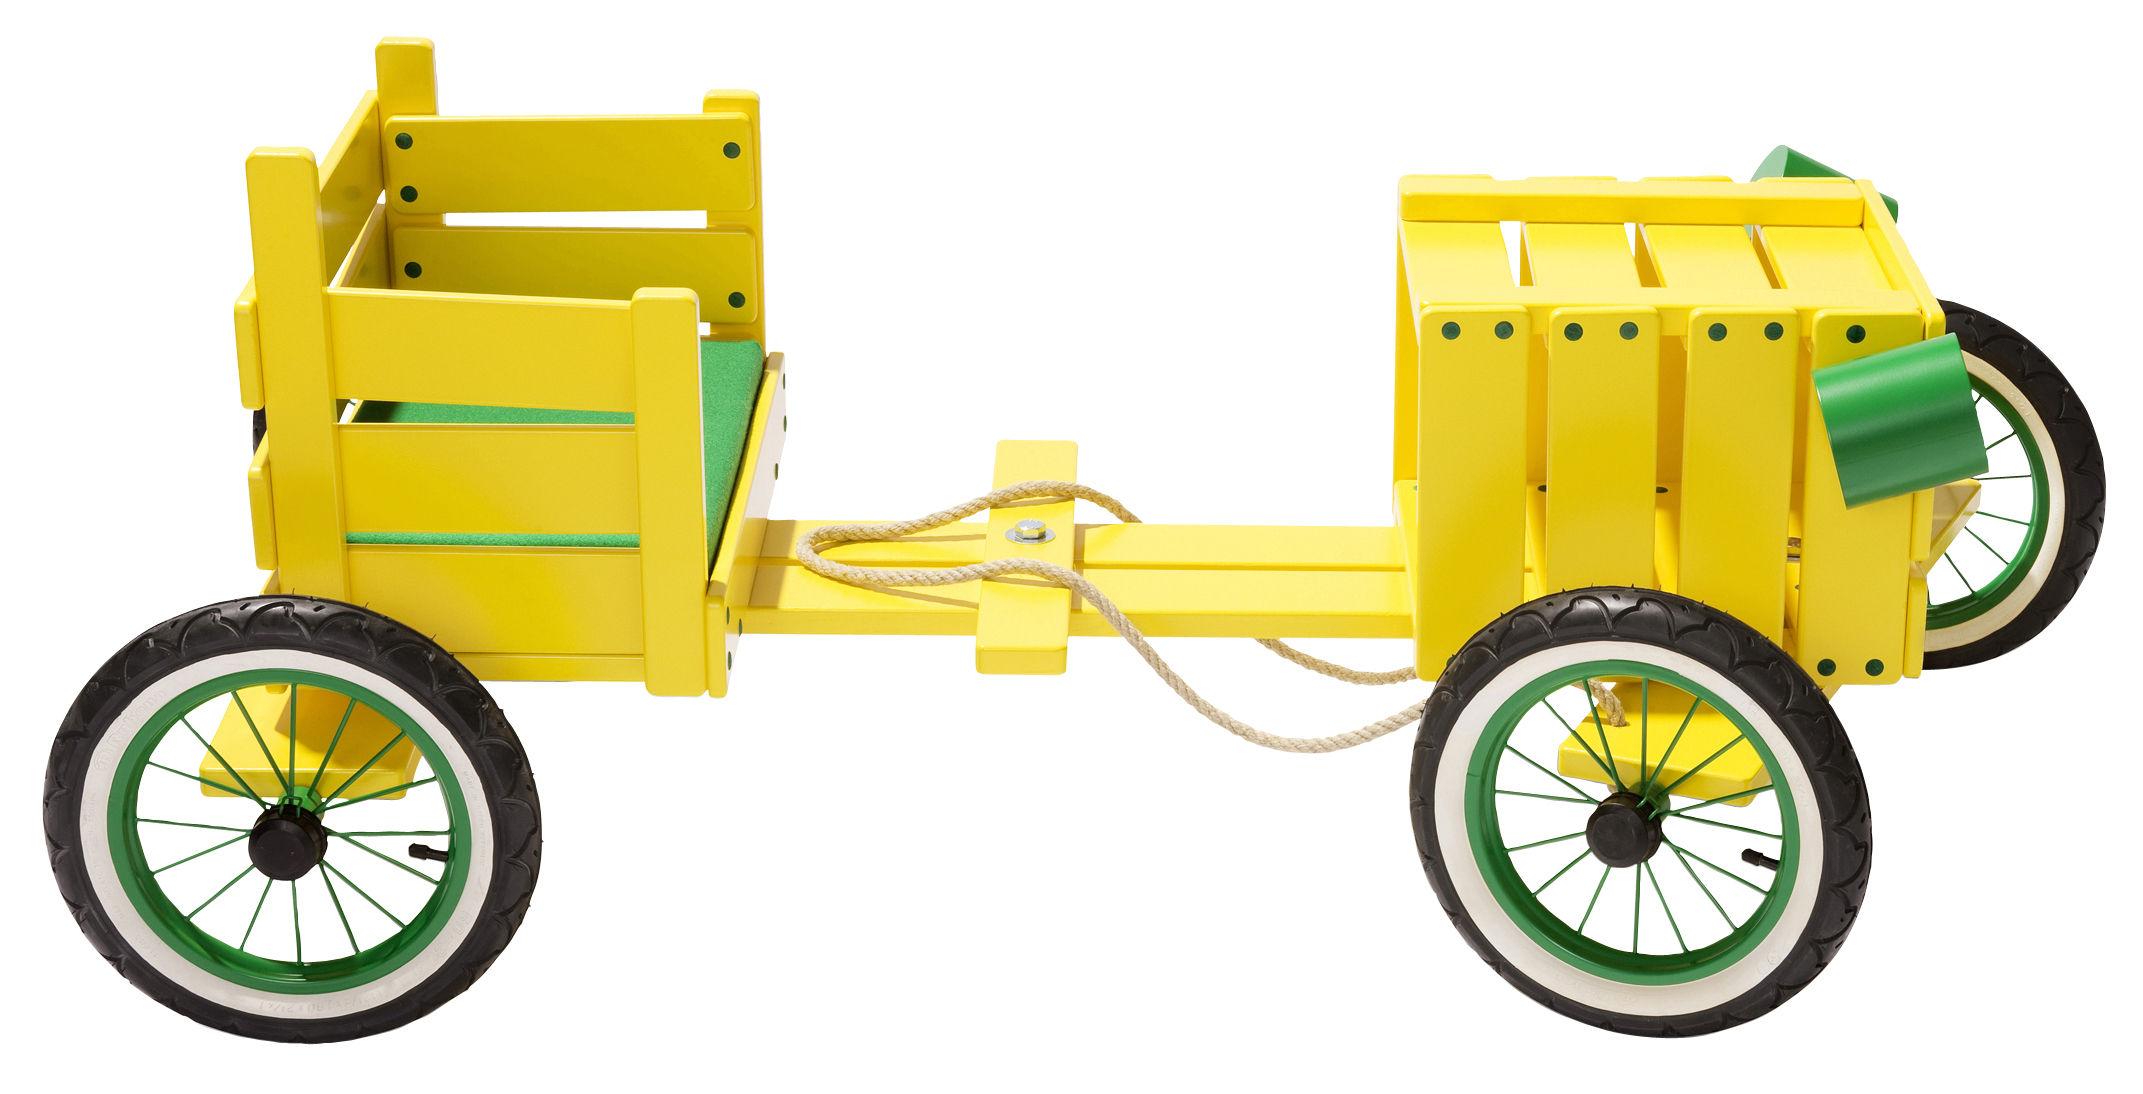 play spielzeug auto f r kinder gelb und gr n by normann. Black Bedroom Furniture Sets. Home Design Ideas